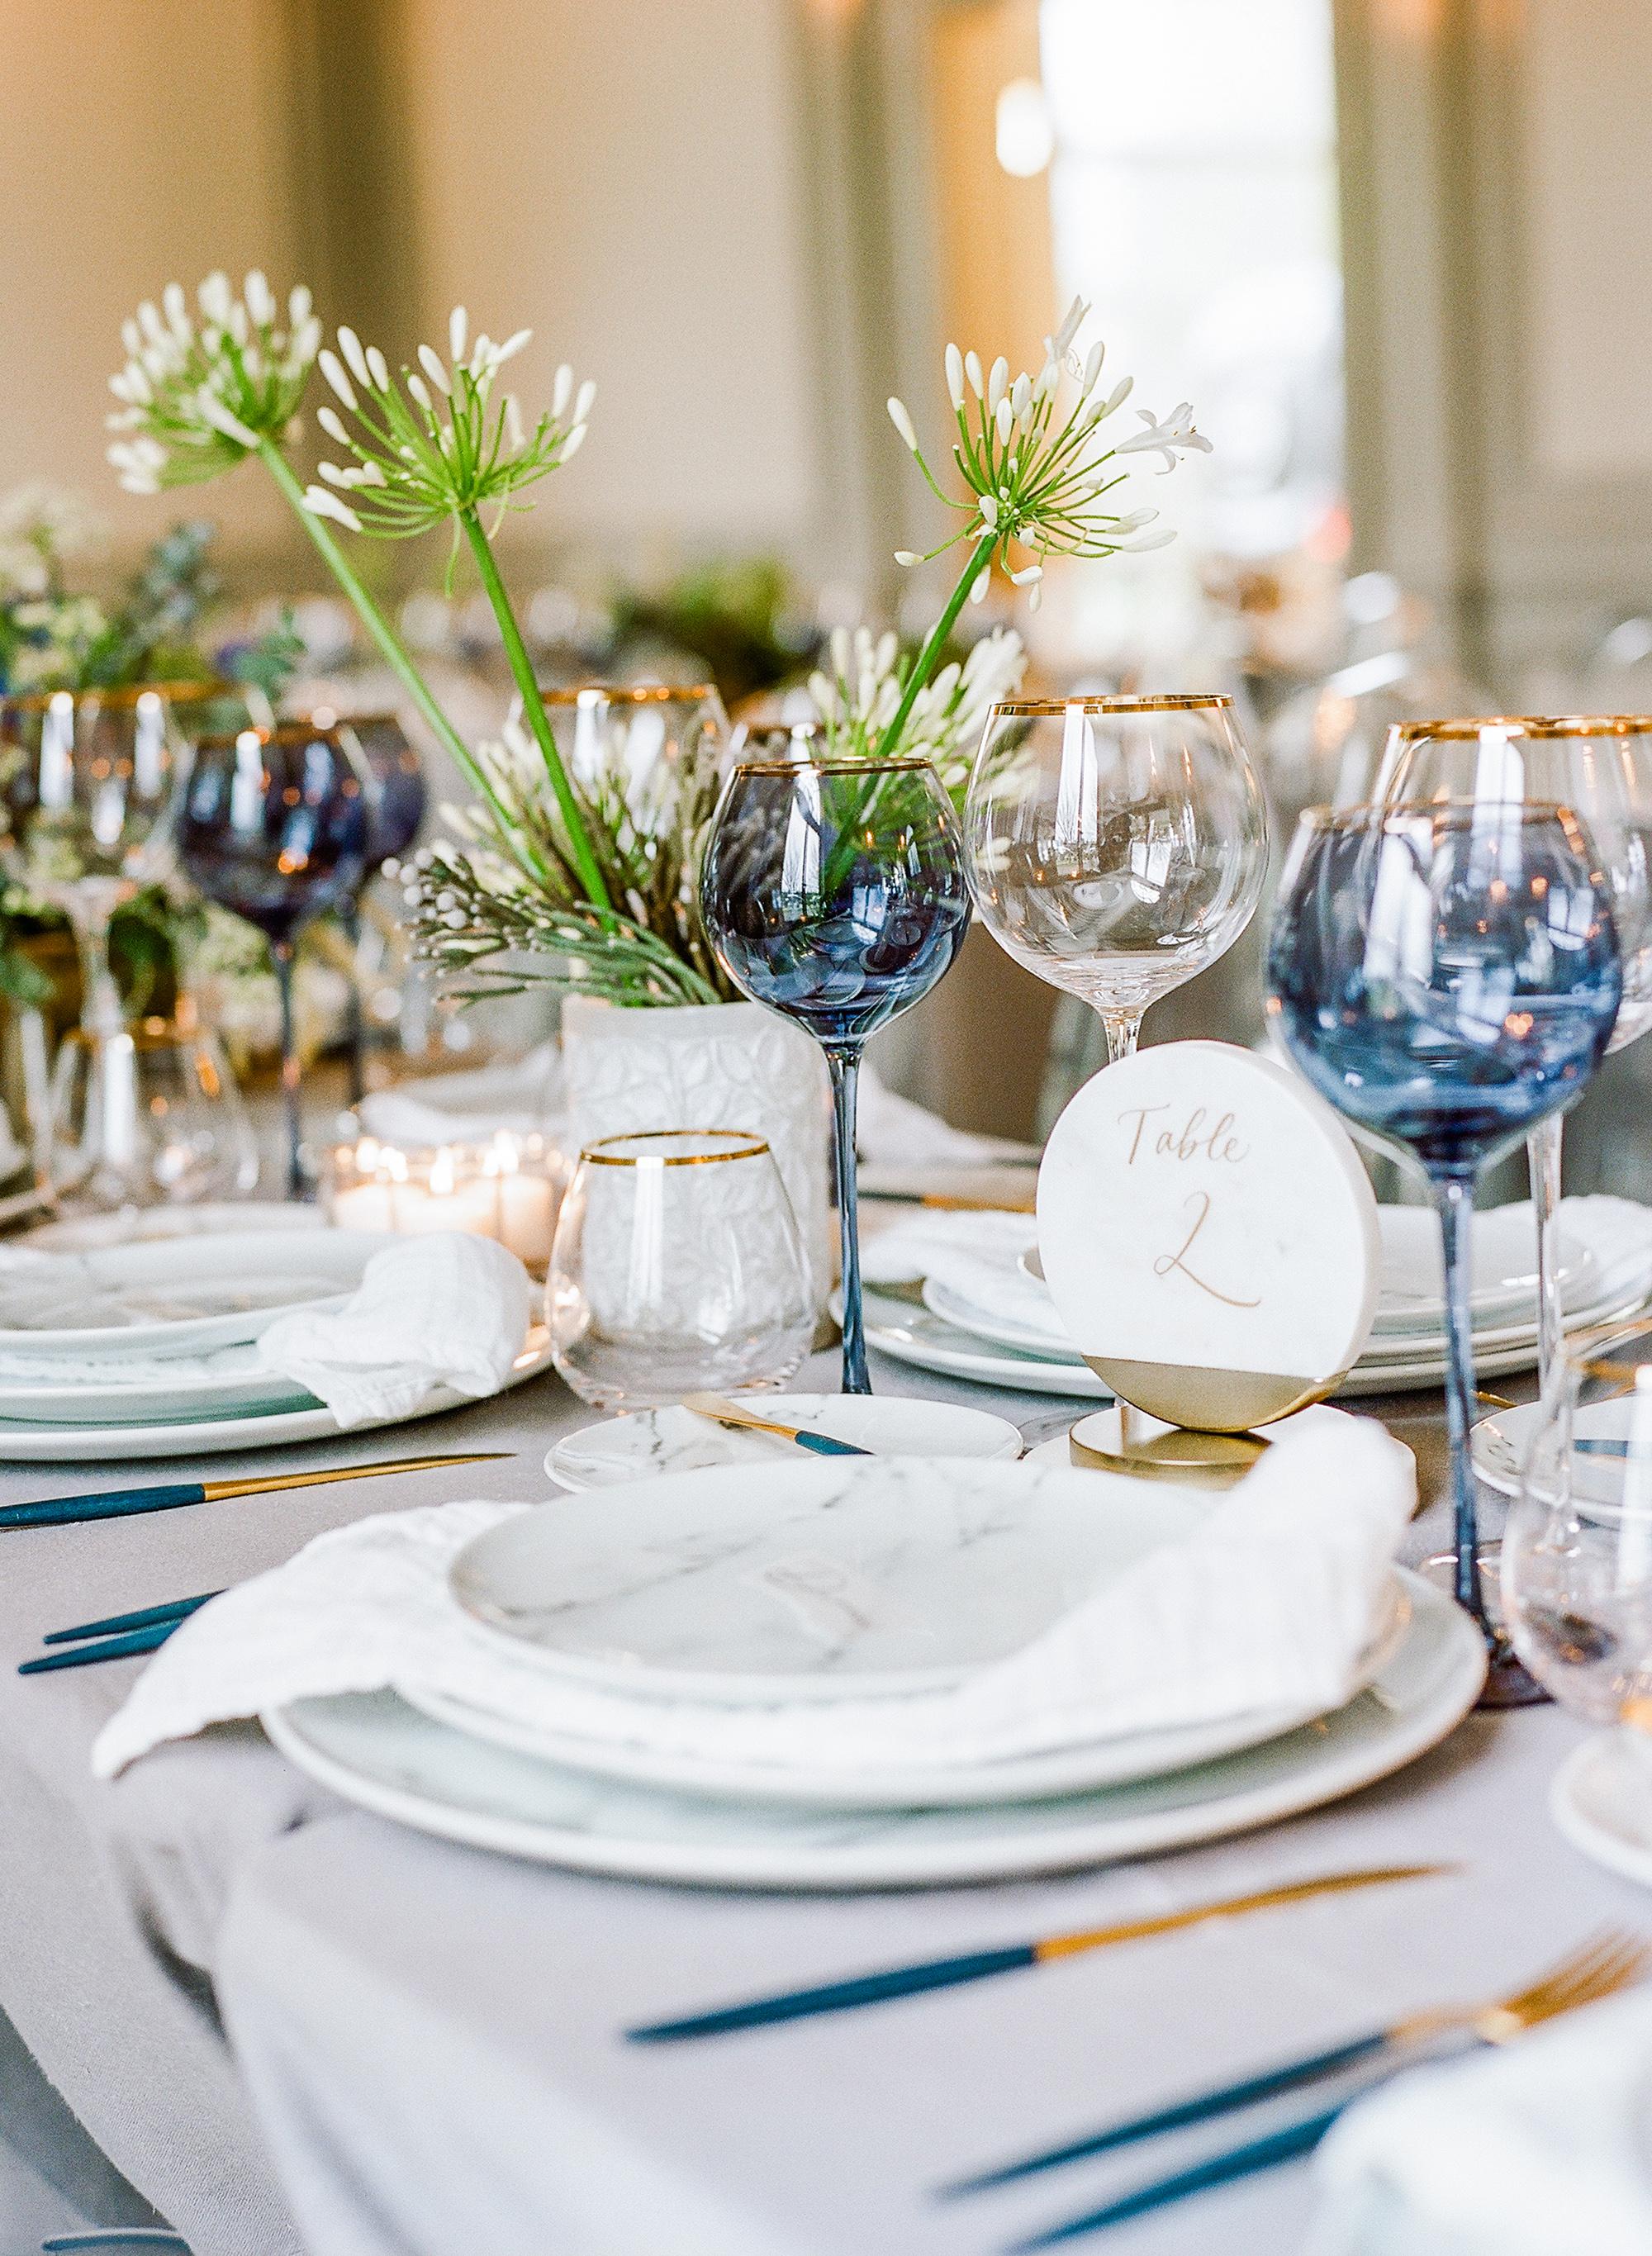 michelle robert wedding table number